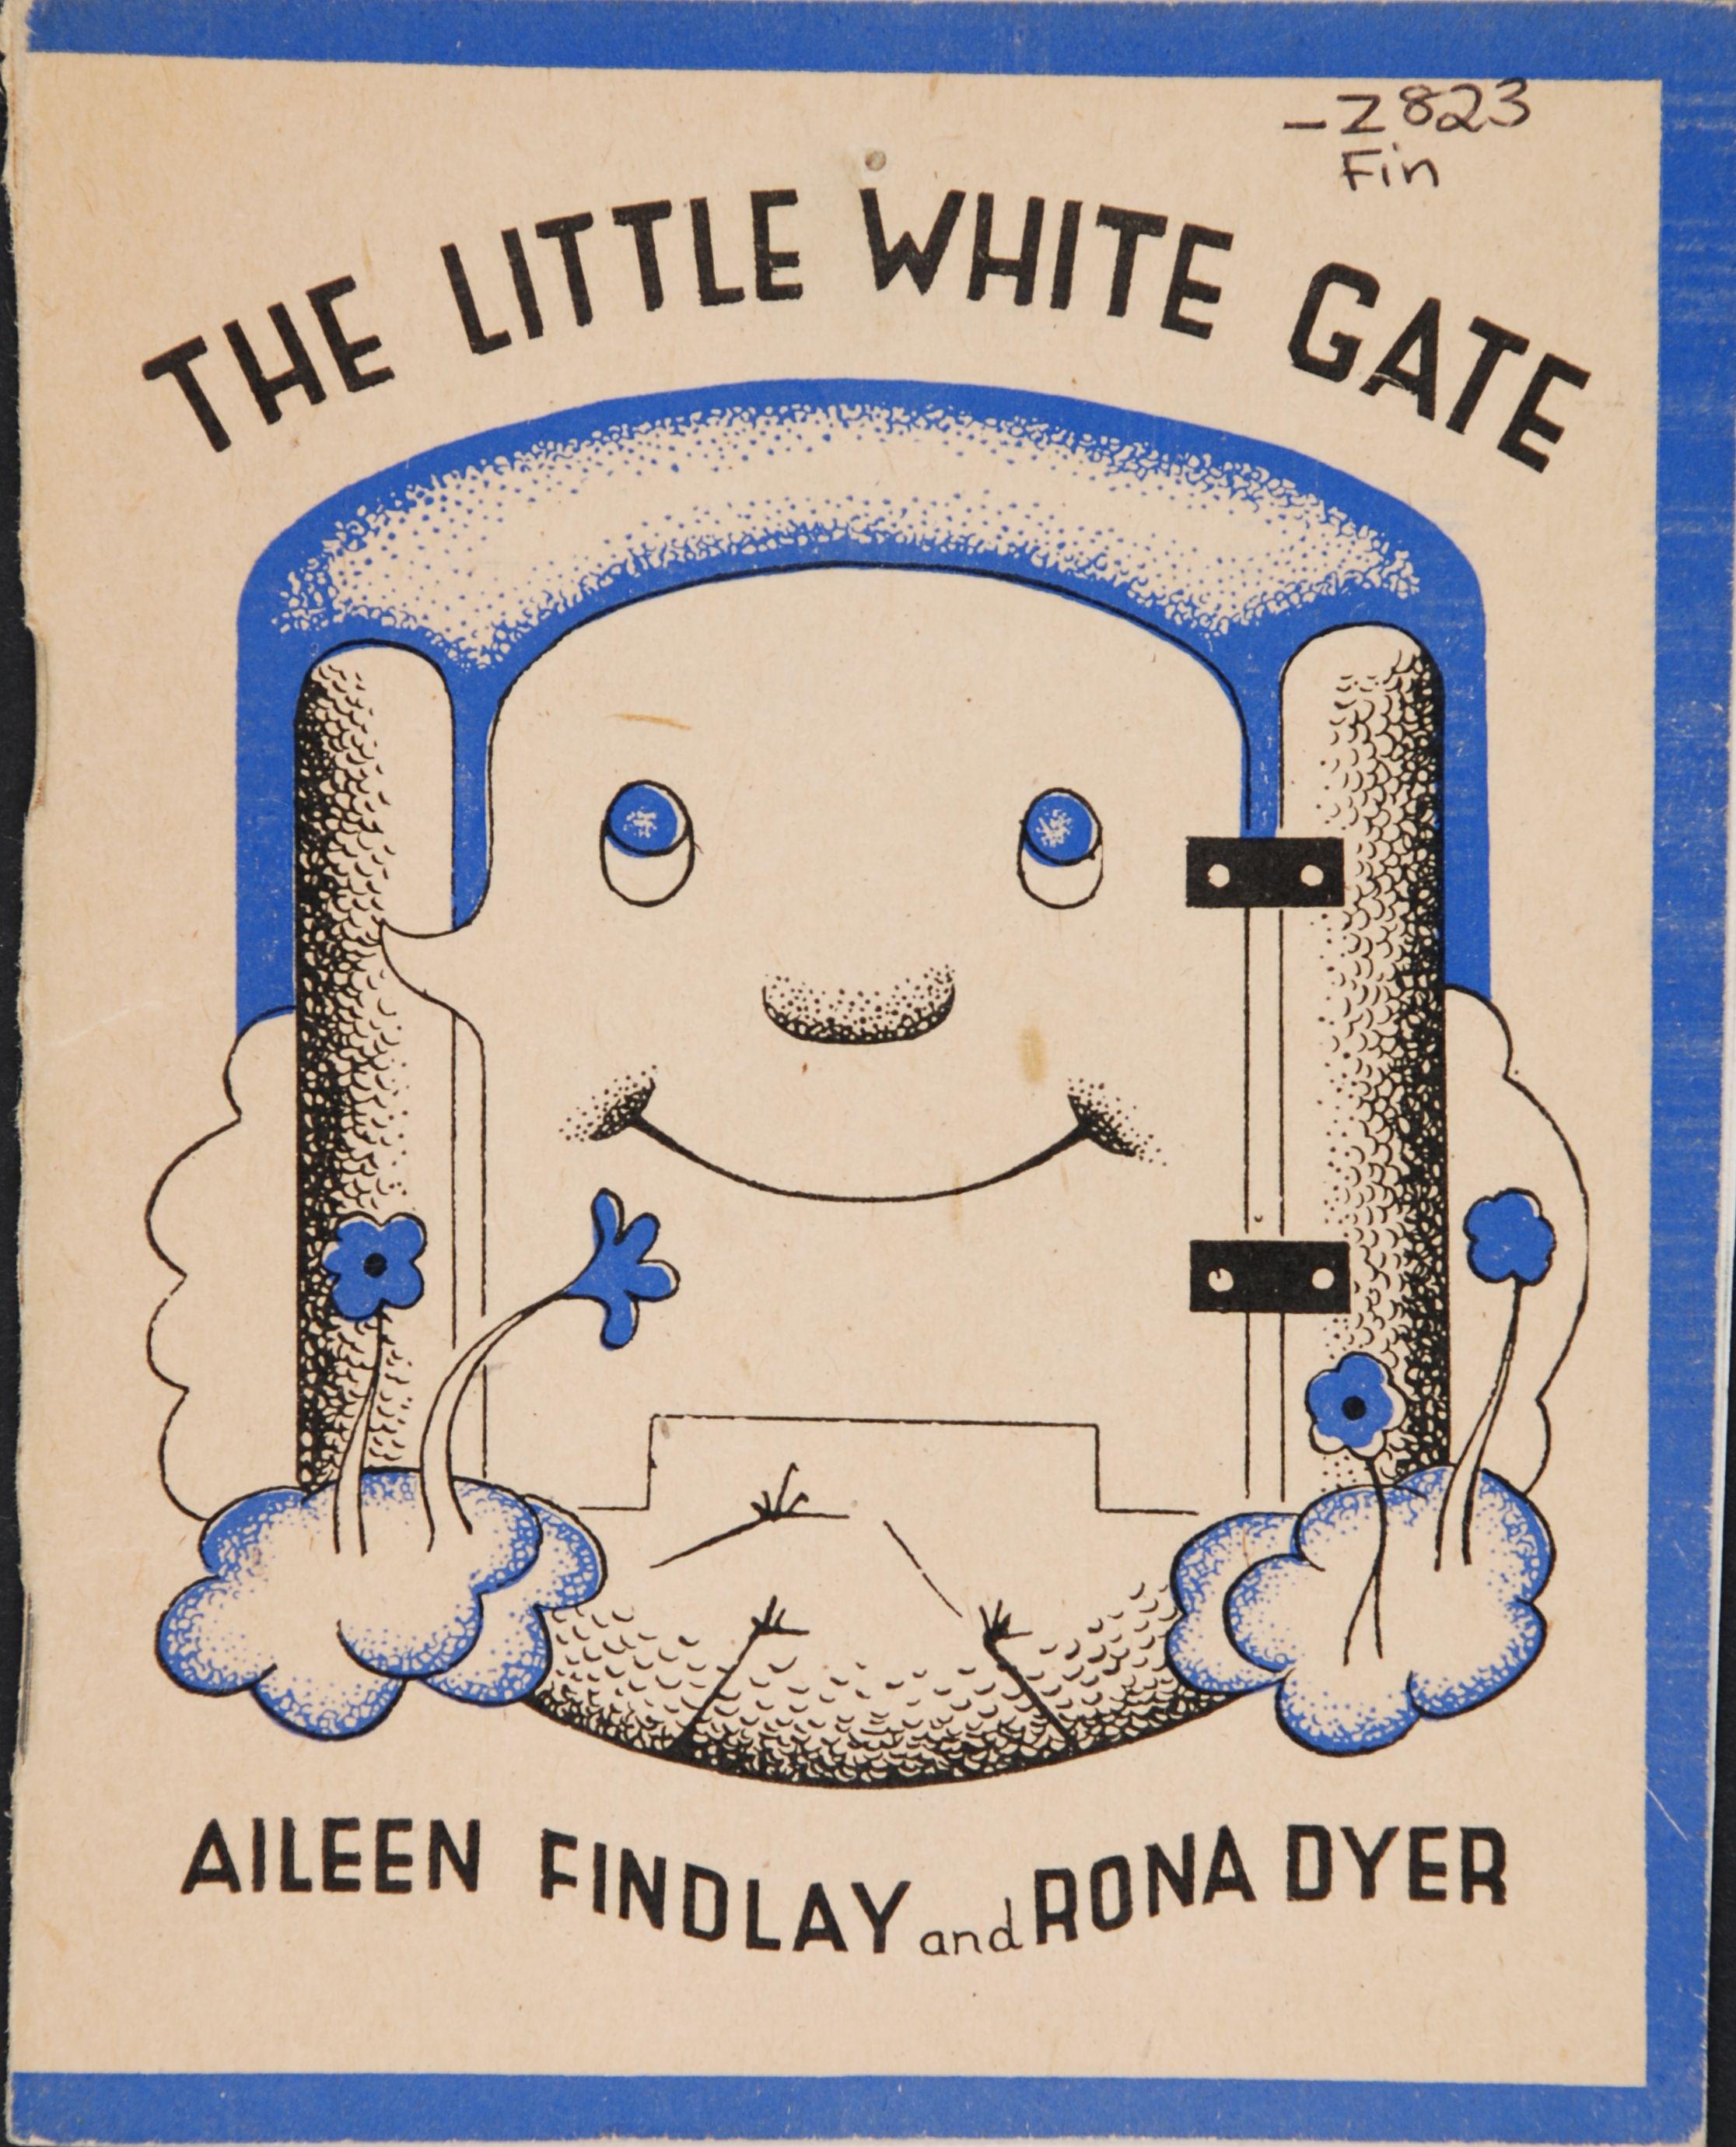 Aileen Findlay. The little white gate. Dunedin, N.Z.: Progressive Pub. Society, c1944.